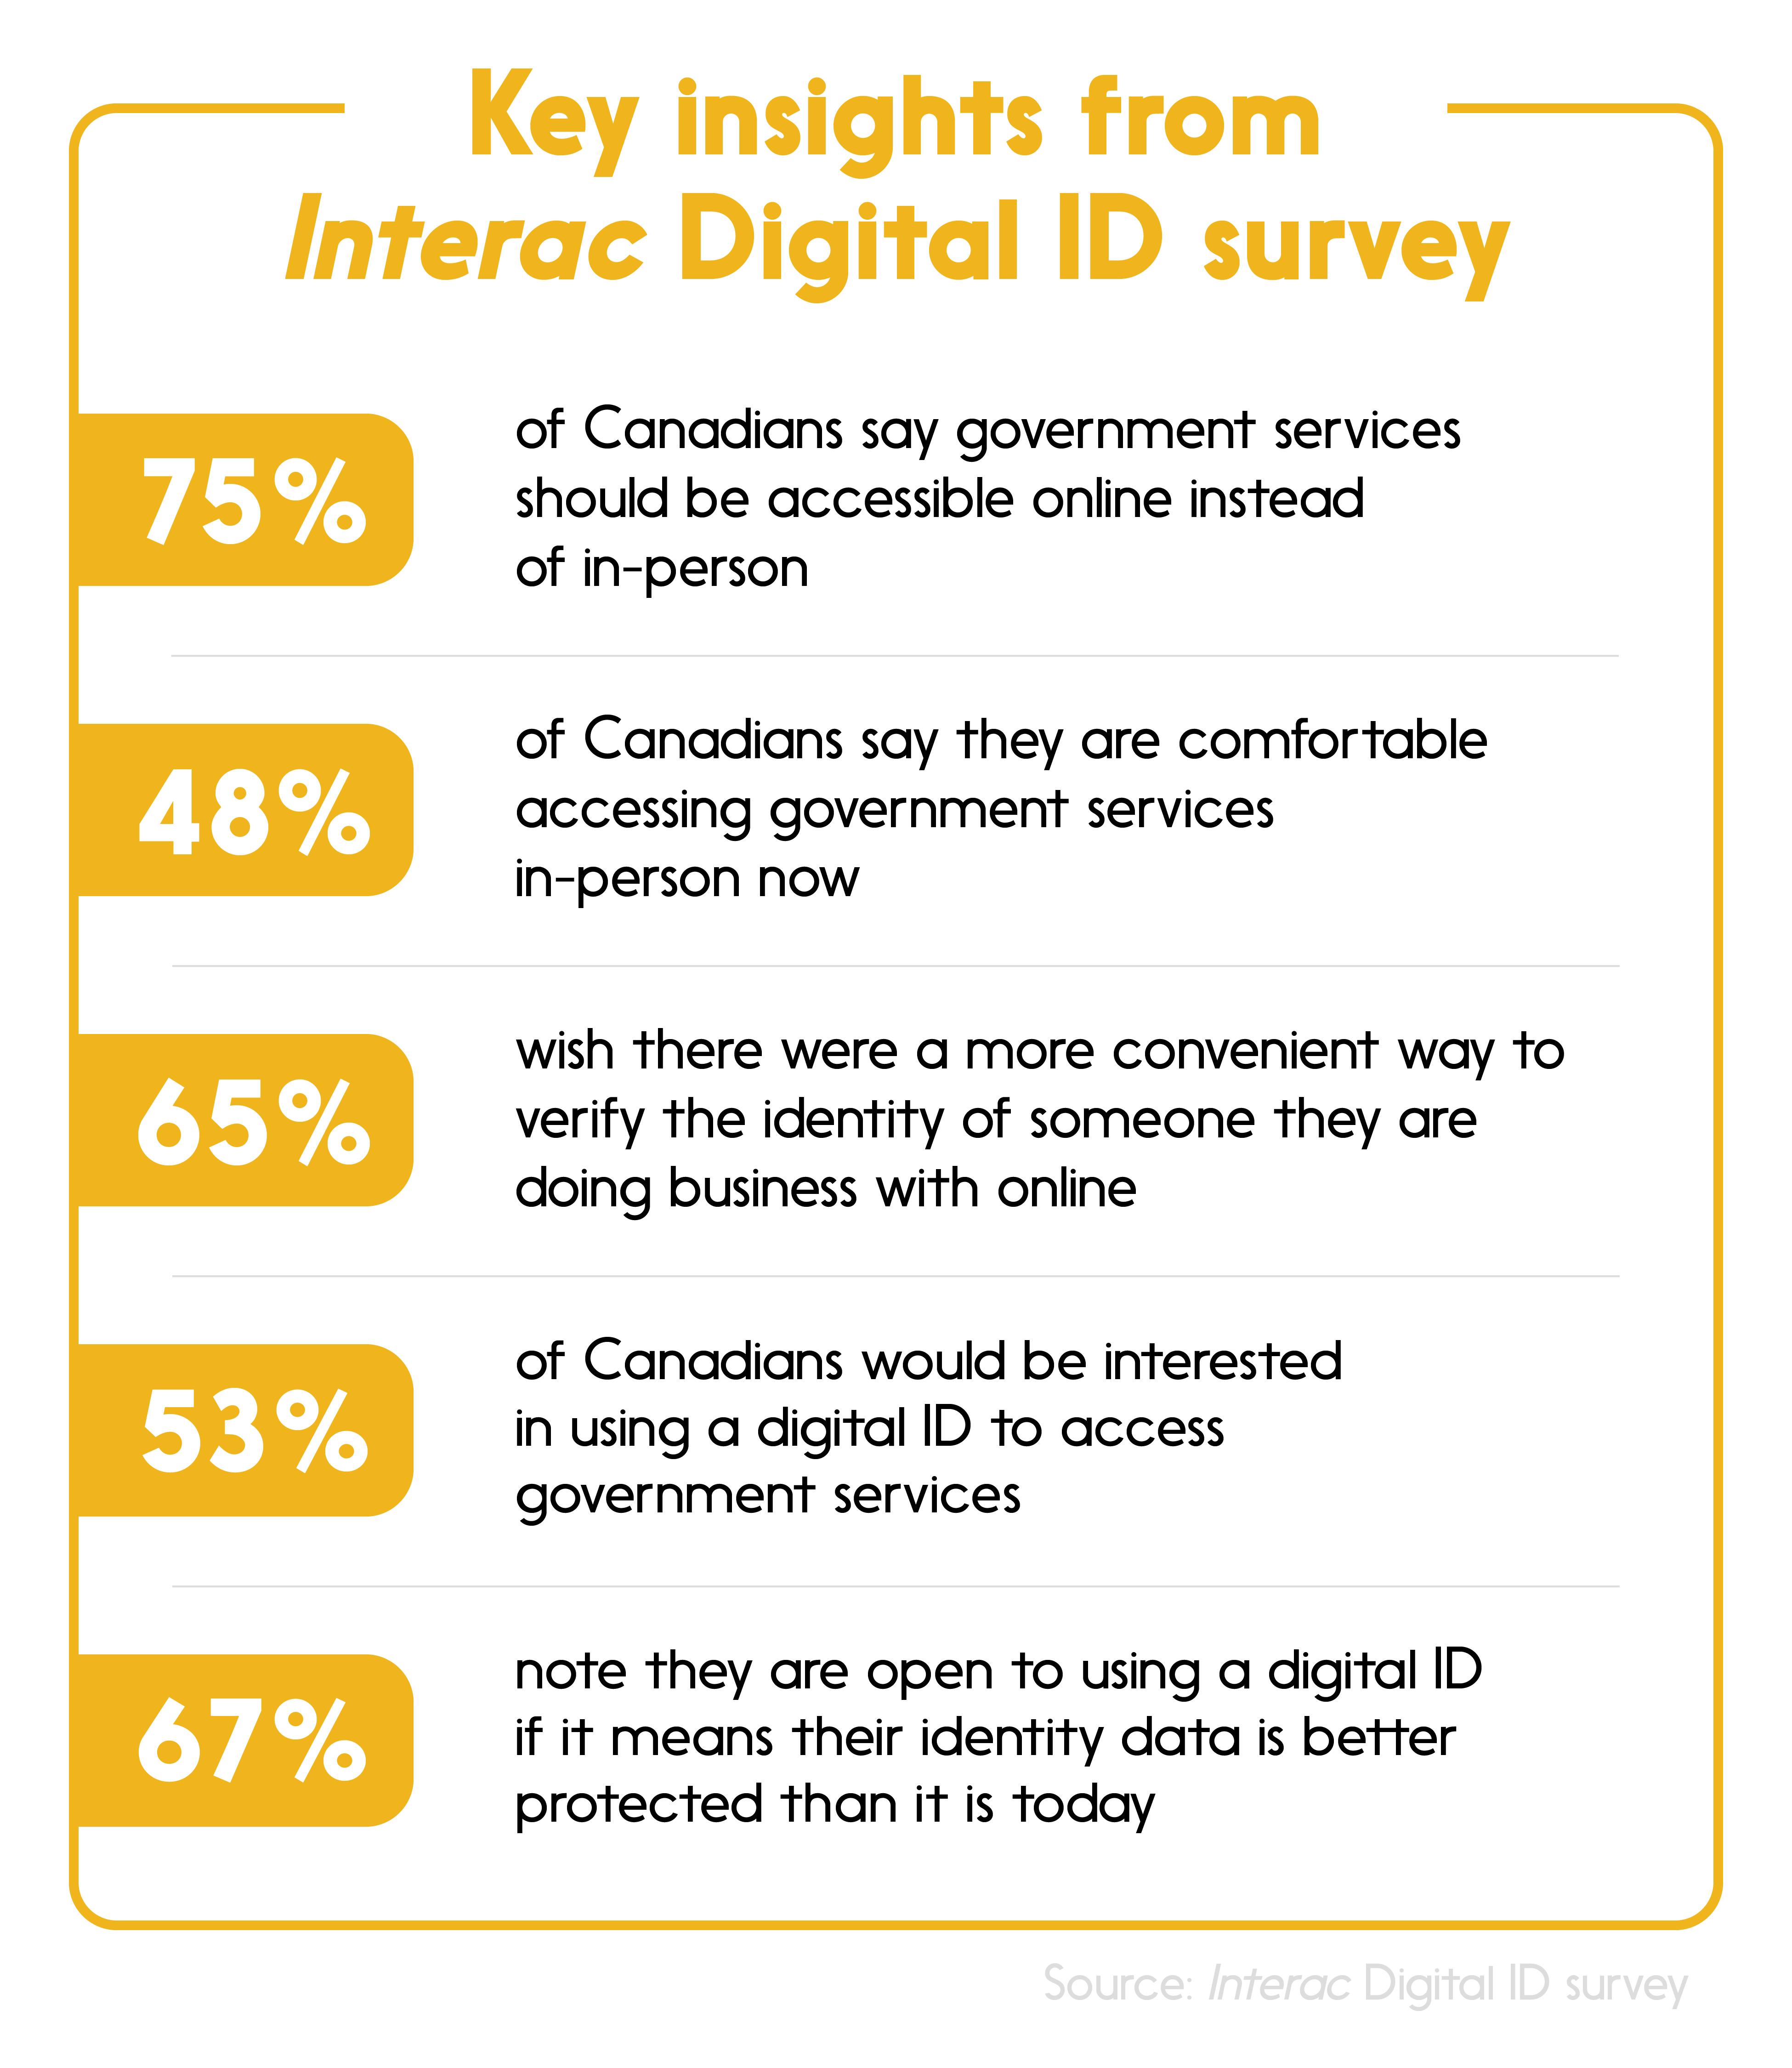 Interac Digital ID Sruvey results